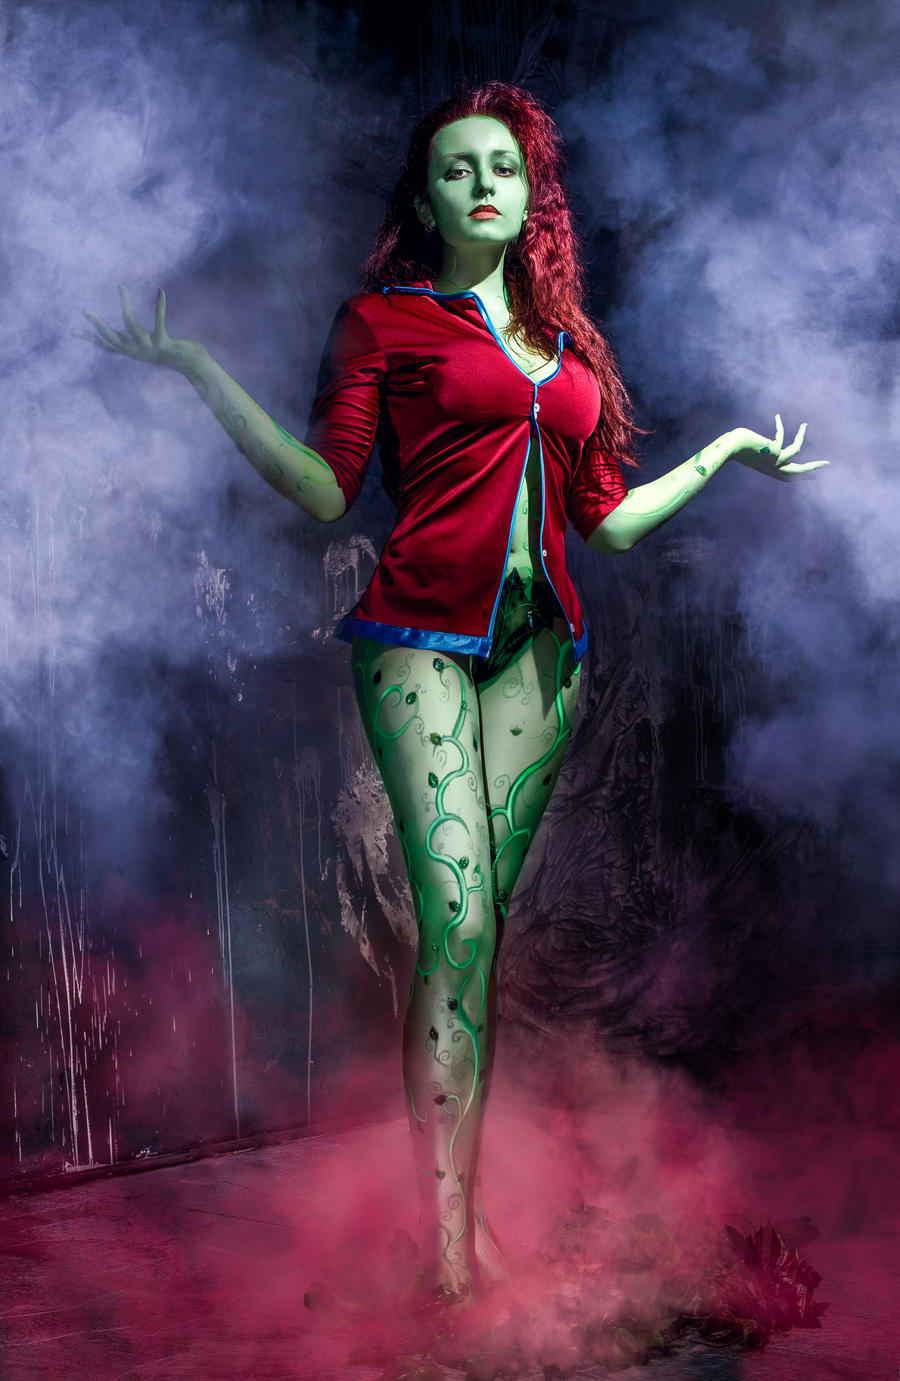 Poison Ivy - Arkham Asylum by ryszard-redfur on DeviantArt